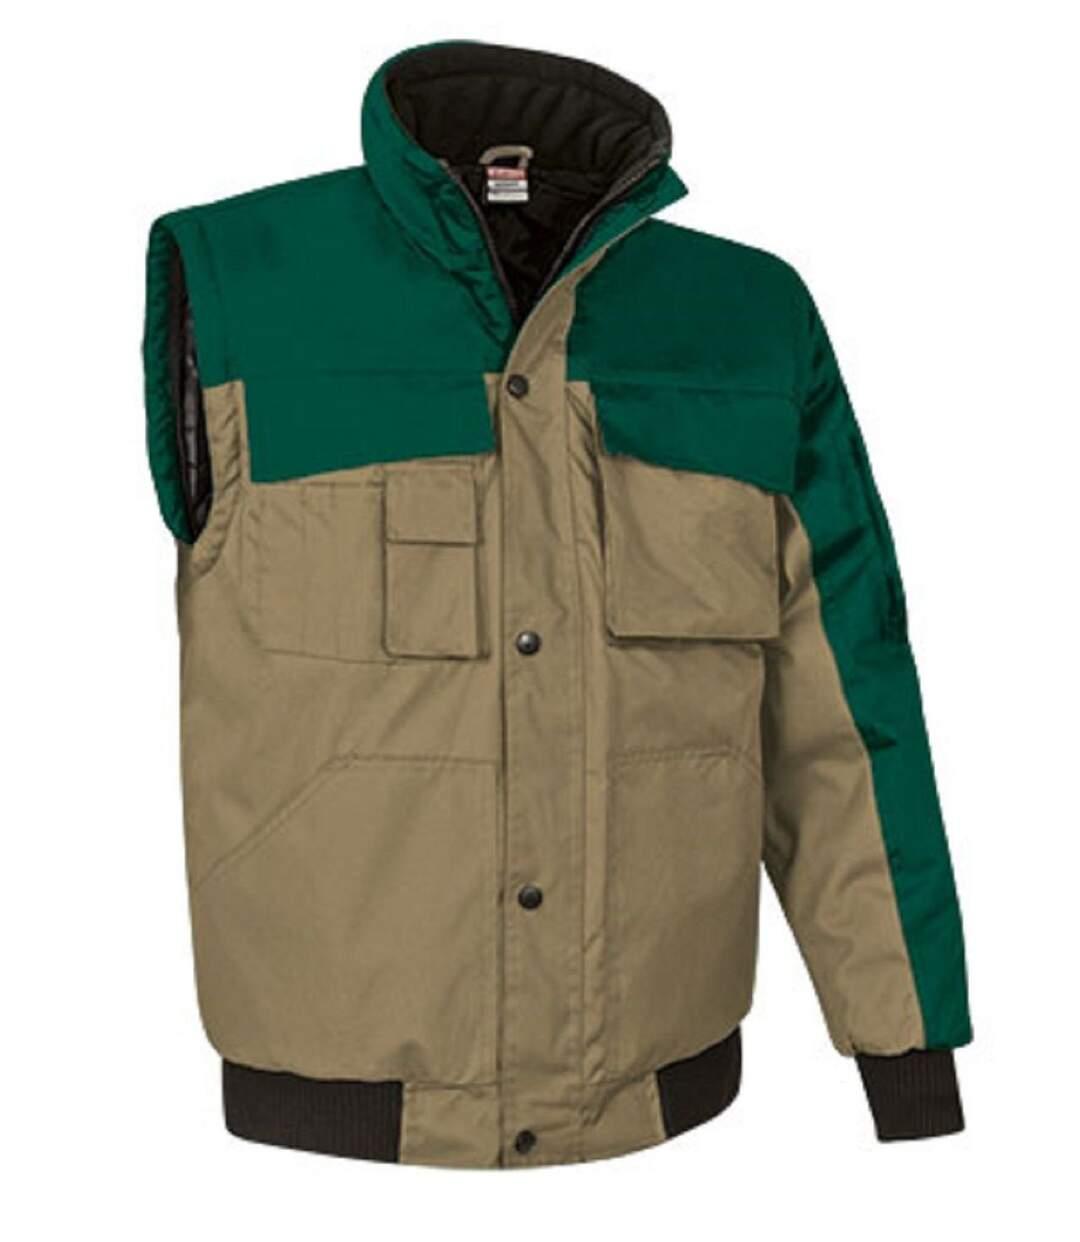 Parka - Homme - REF SCOOT - marron kamel et vert